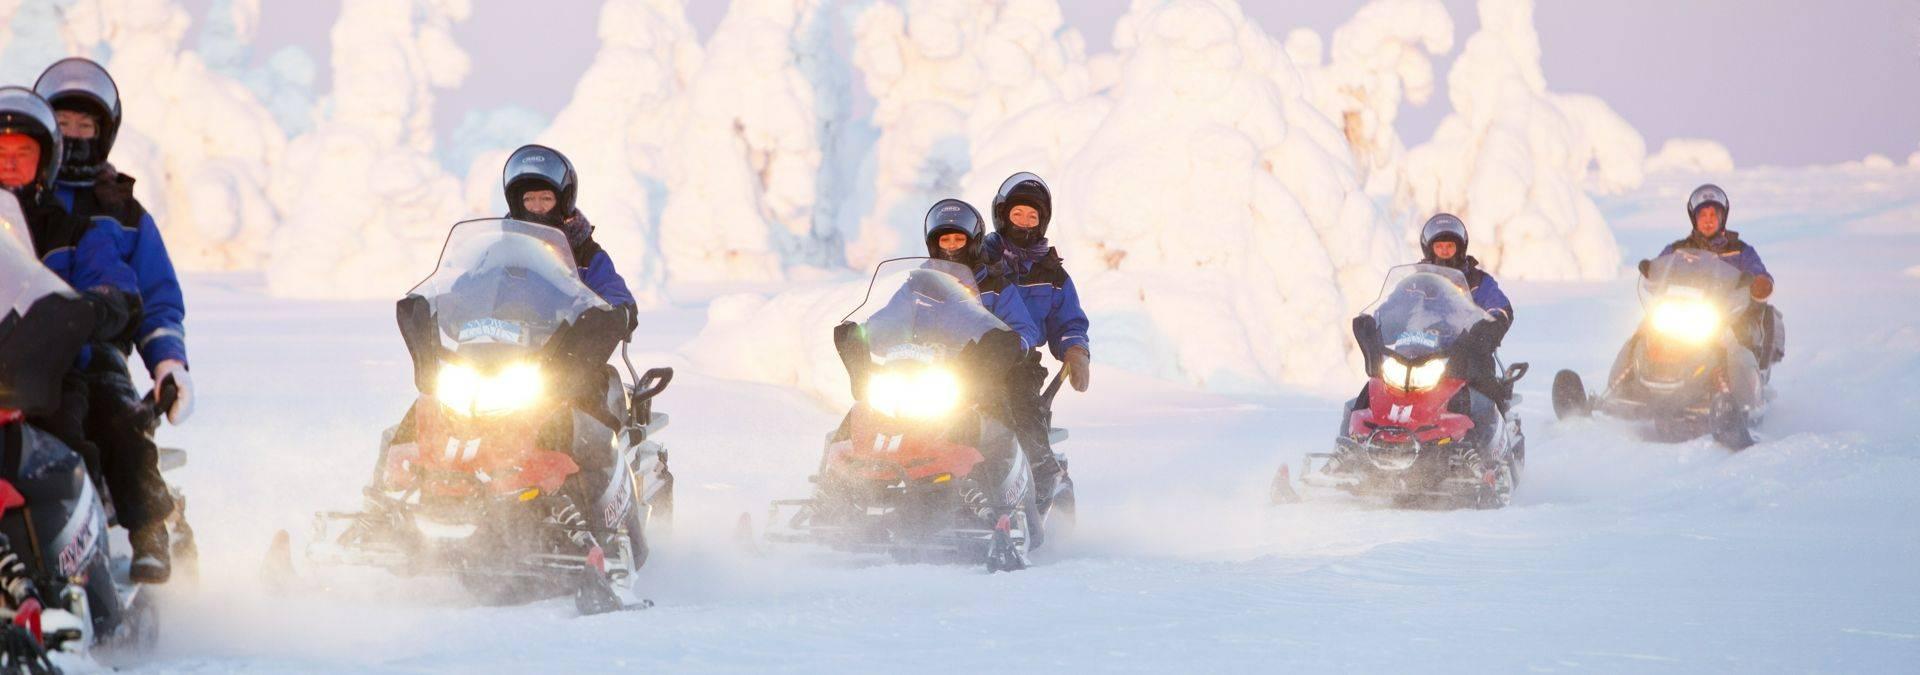 snowmobile (8).jpg